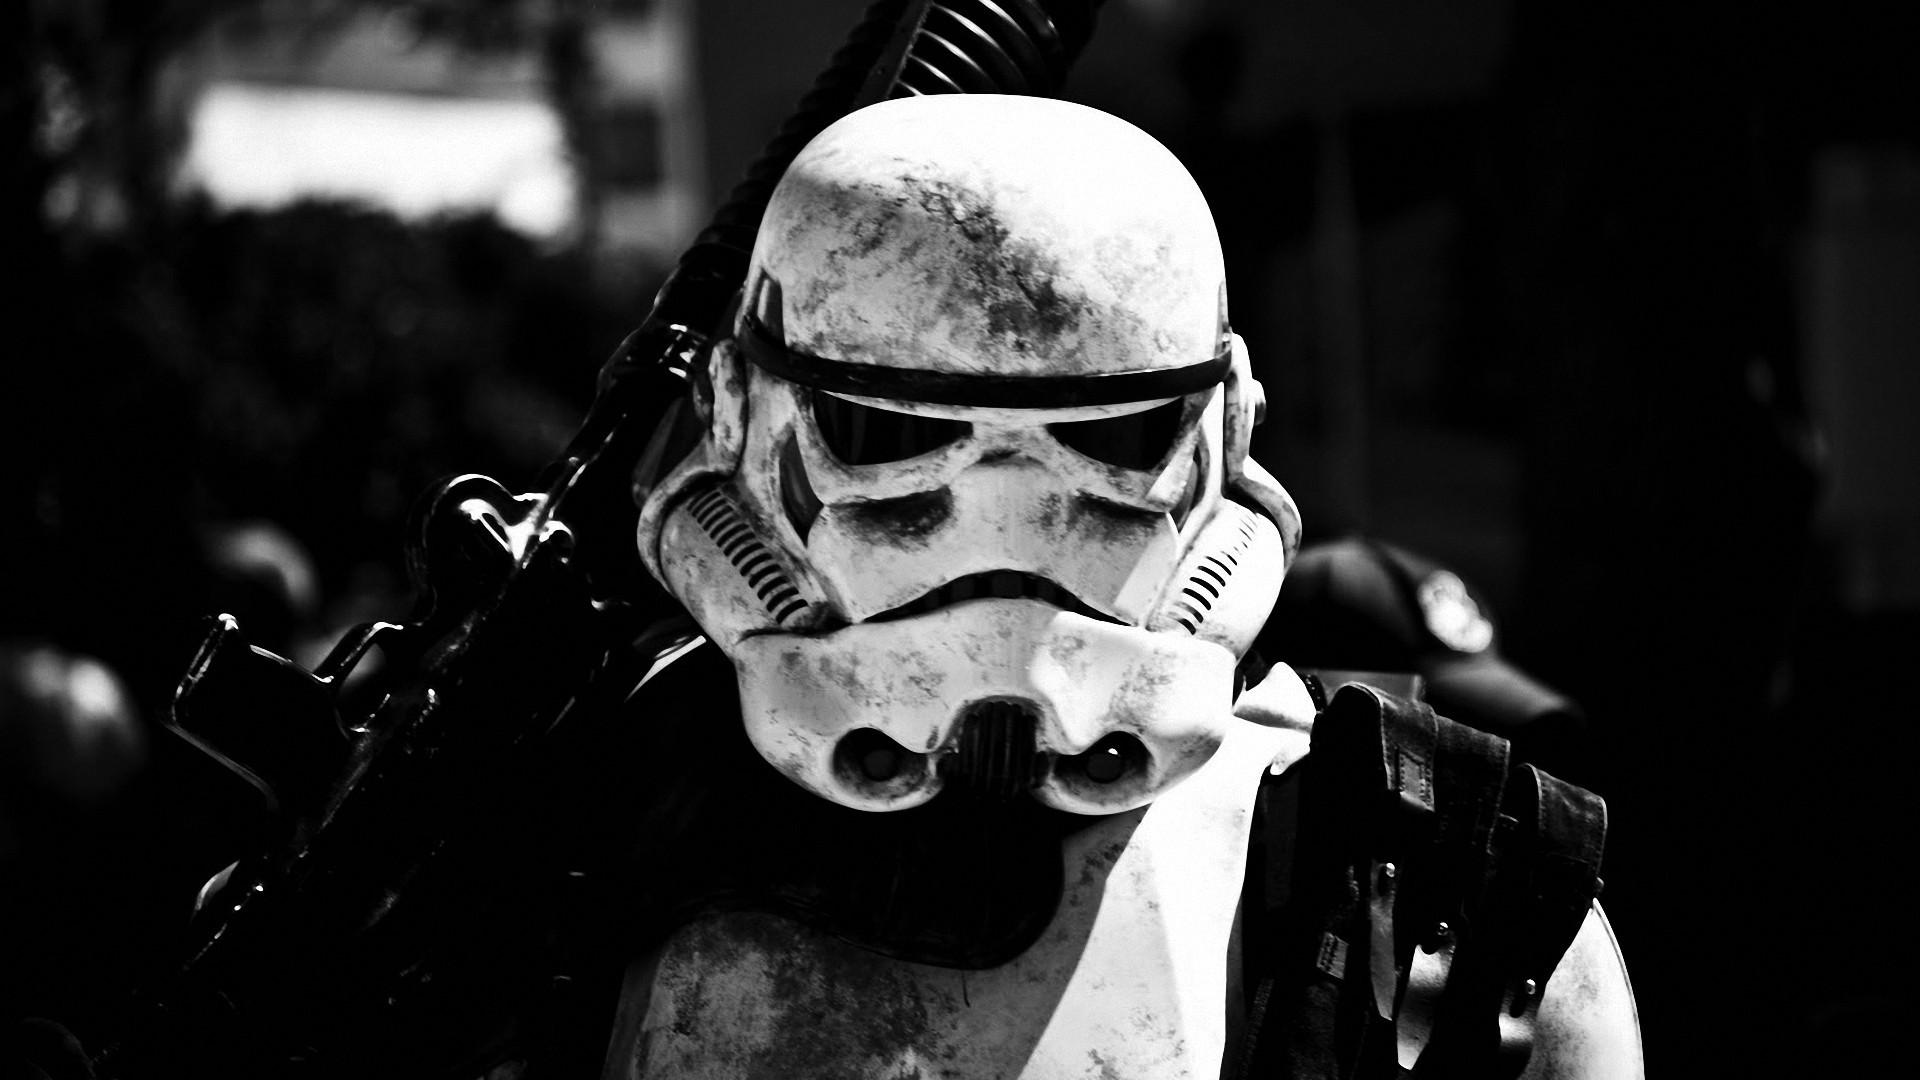 Stormtrooper [1920×1080]. #Followme #CooliPhone6Case on #Twitter #Facebook  #Google #Instagram #LinkedIn #Blogger #Tumblr #Youtube   Pinterest    Facebook, …